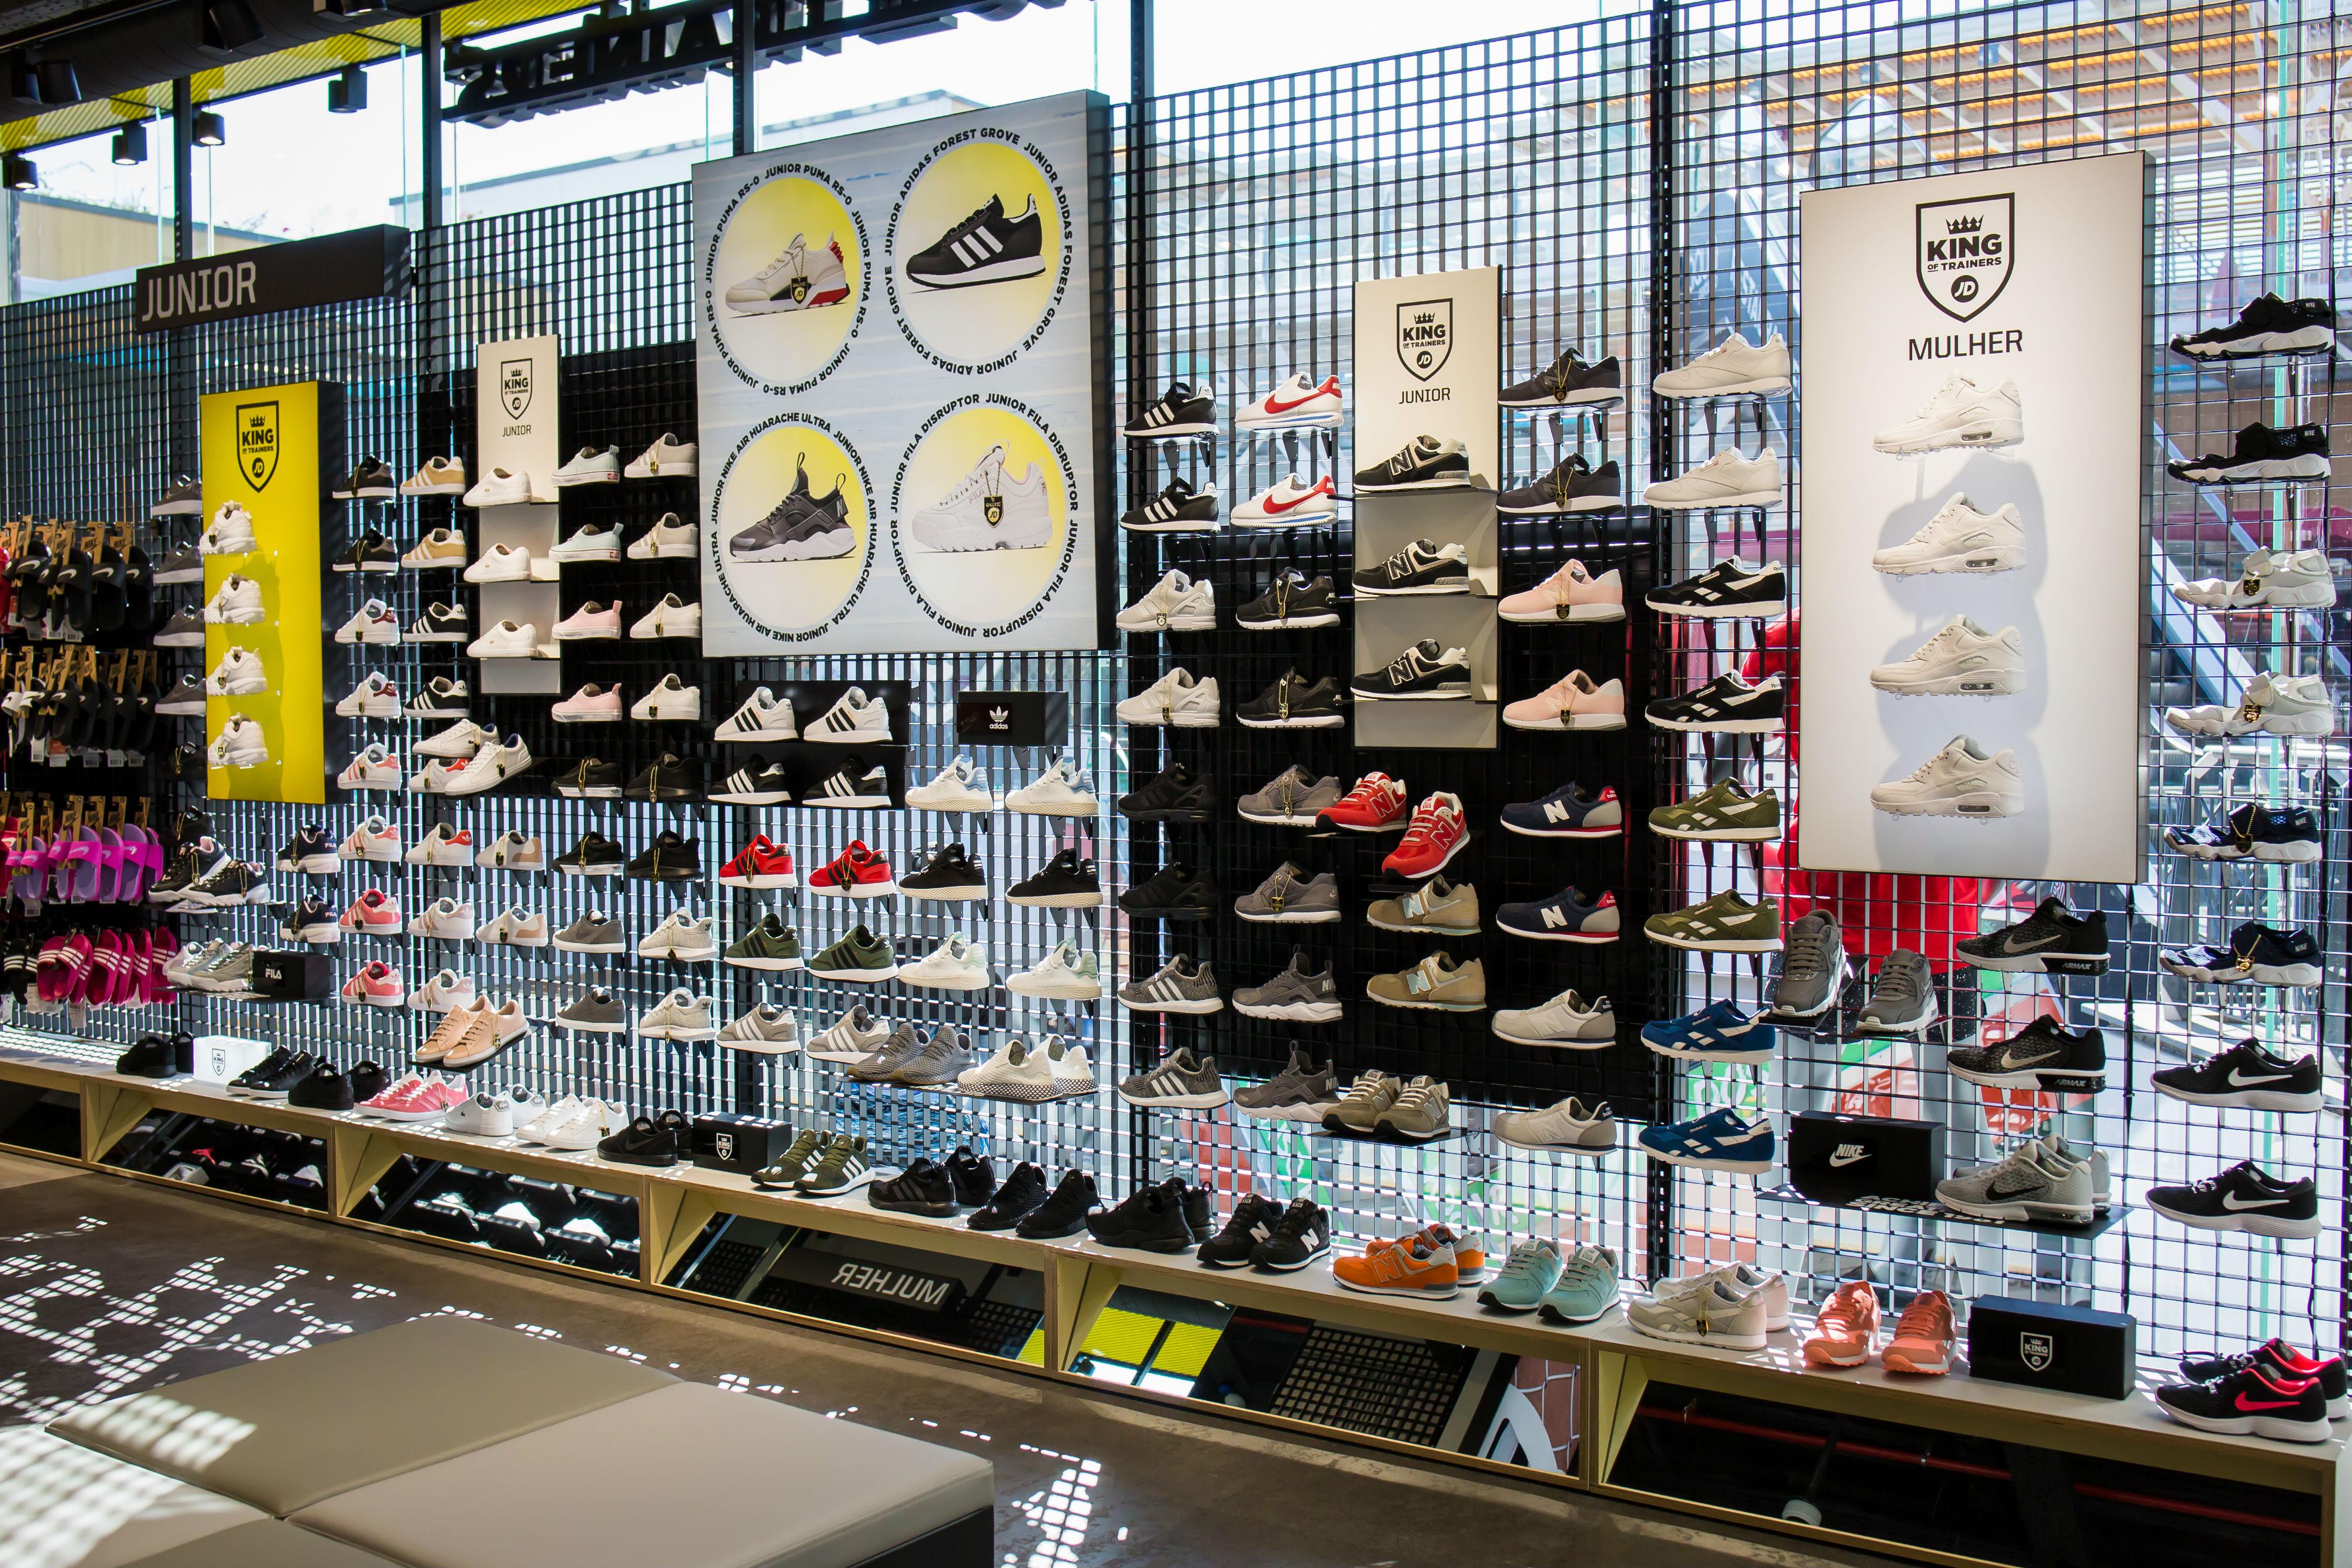 d8a1fecaacb Nova loja da JD Sports está prestes a chegar a Coimbra